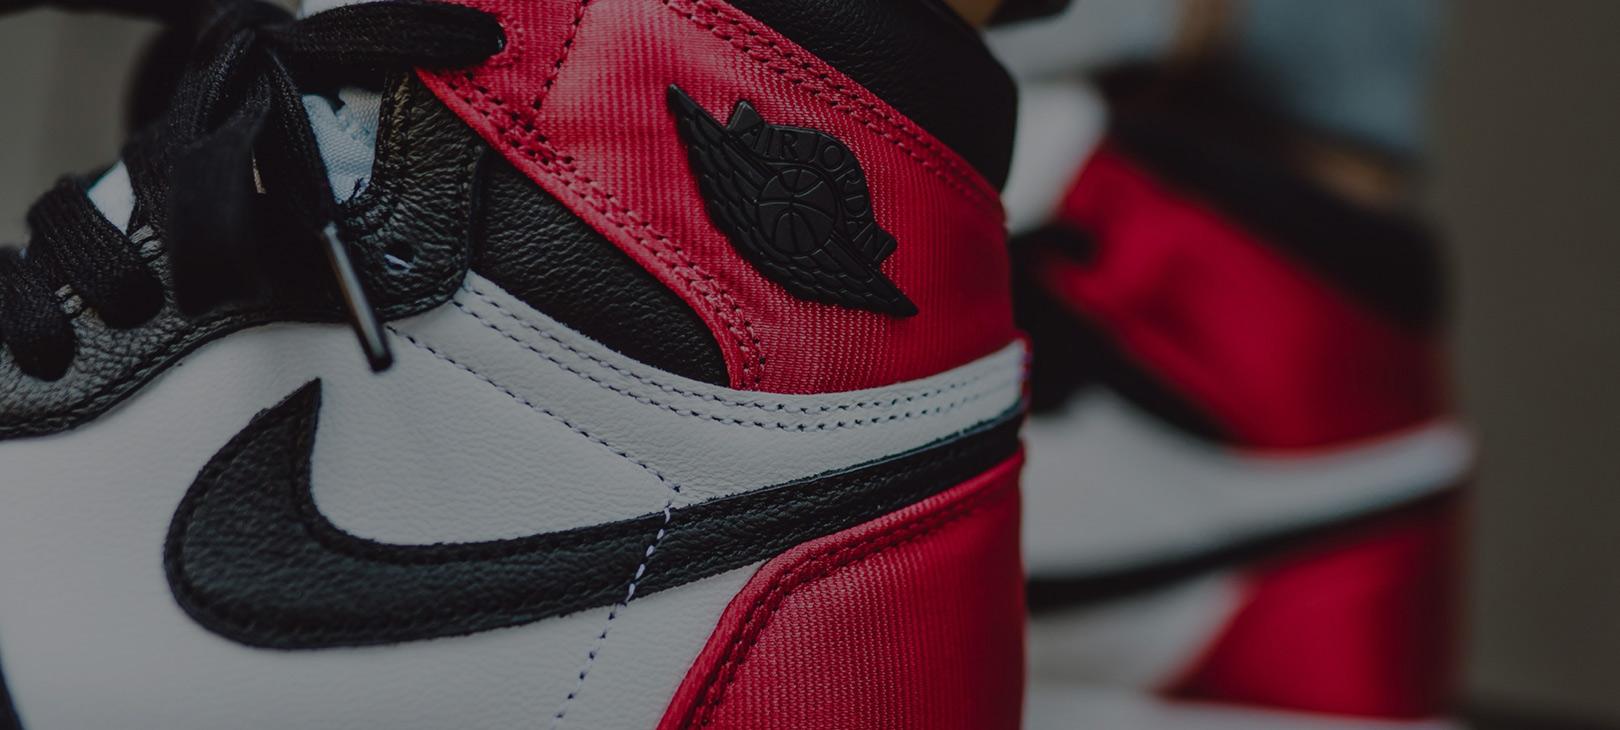 24275420e3c Sneaker News - Jordans, release dates & more.